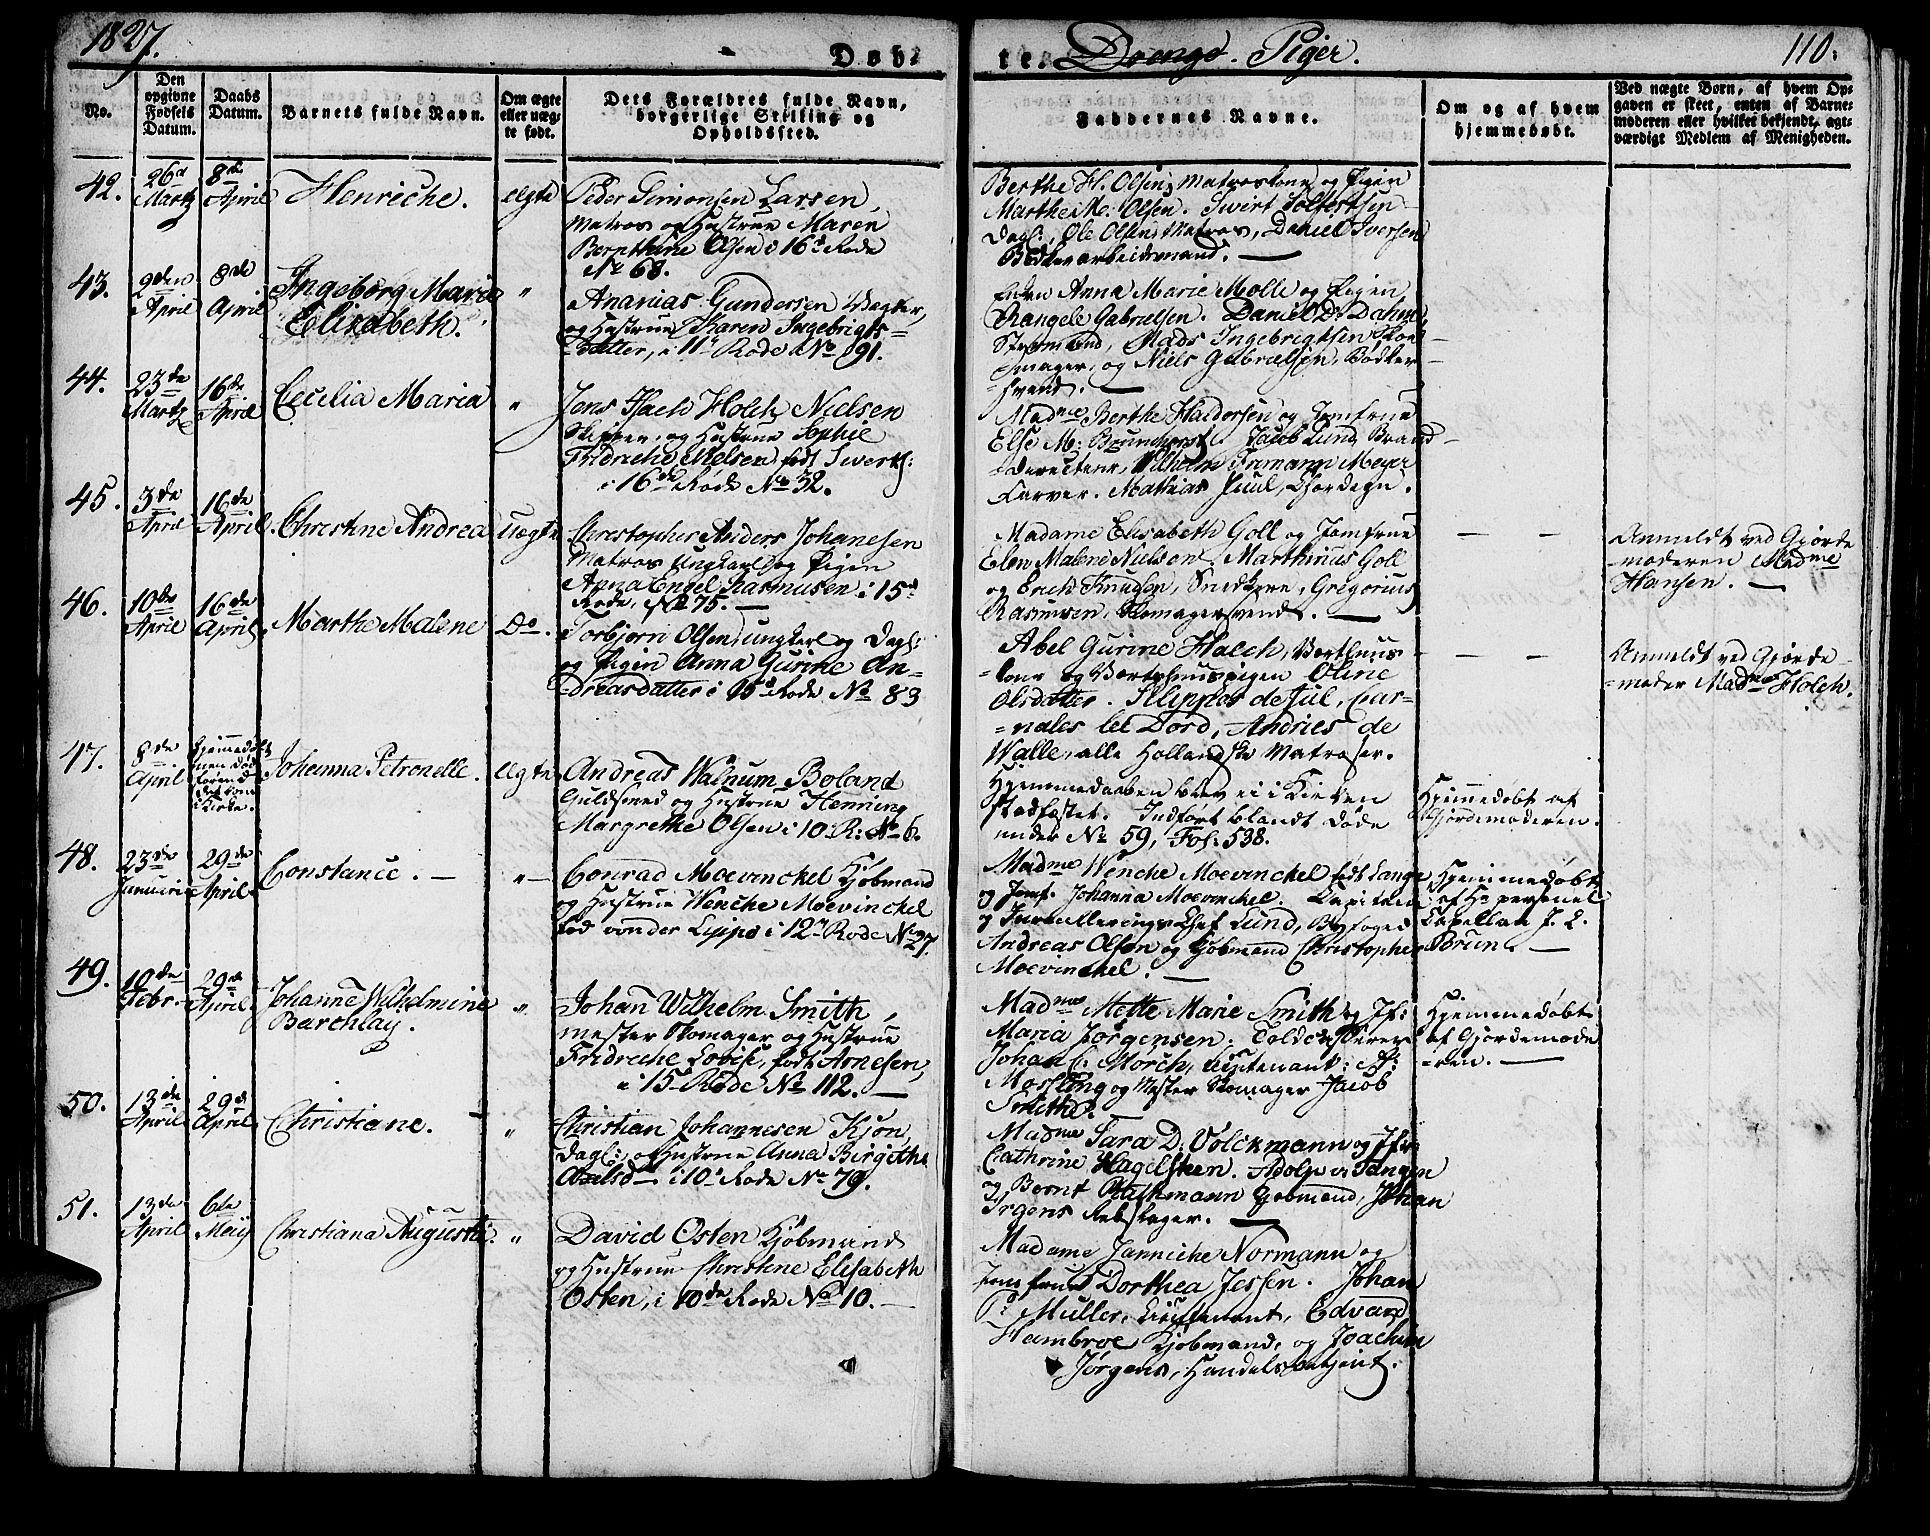 SAB, Domkirken sokneprestembete, H/Haa/L0012: Ministerialbok nr. A 12, 1821-1840, s. 110